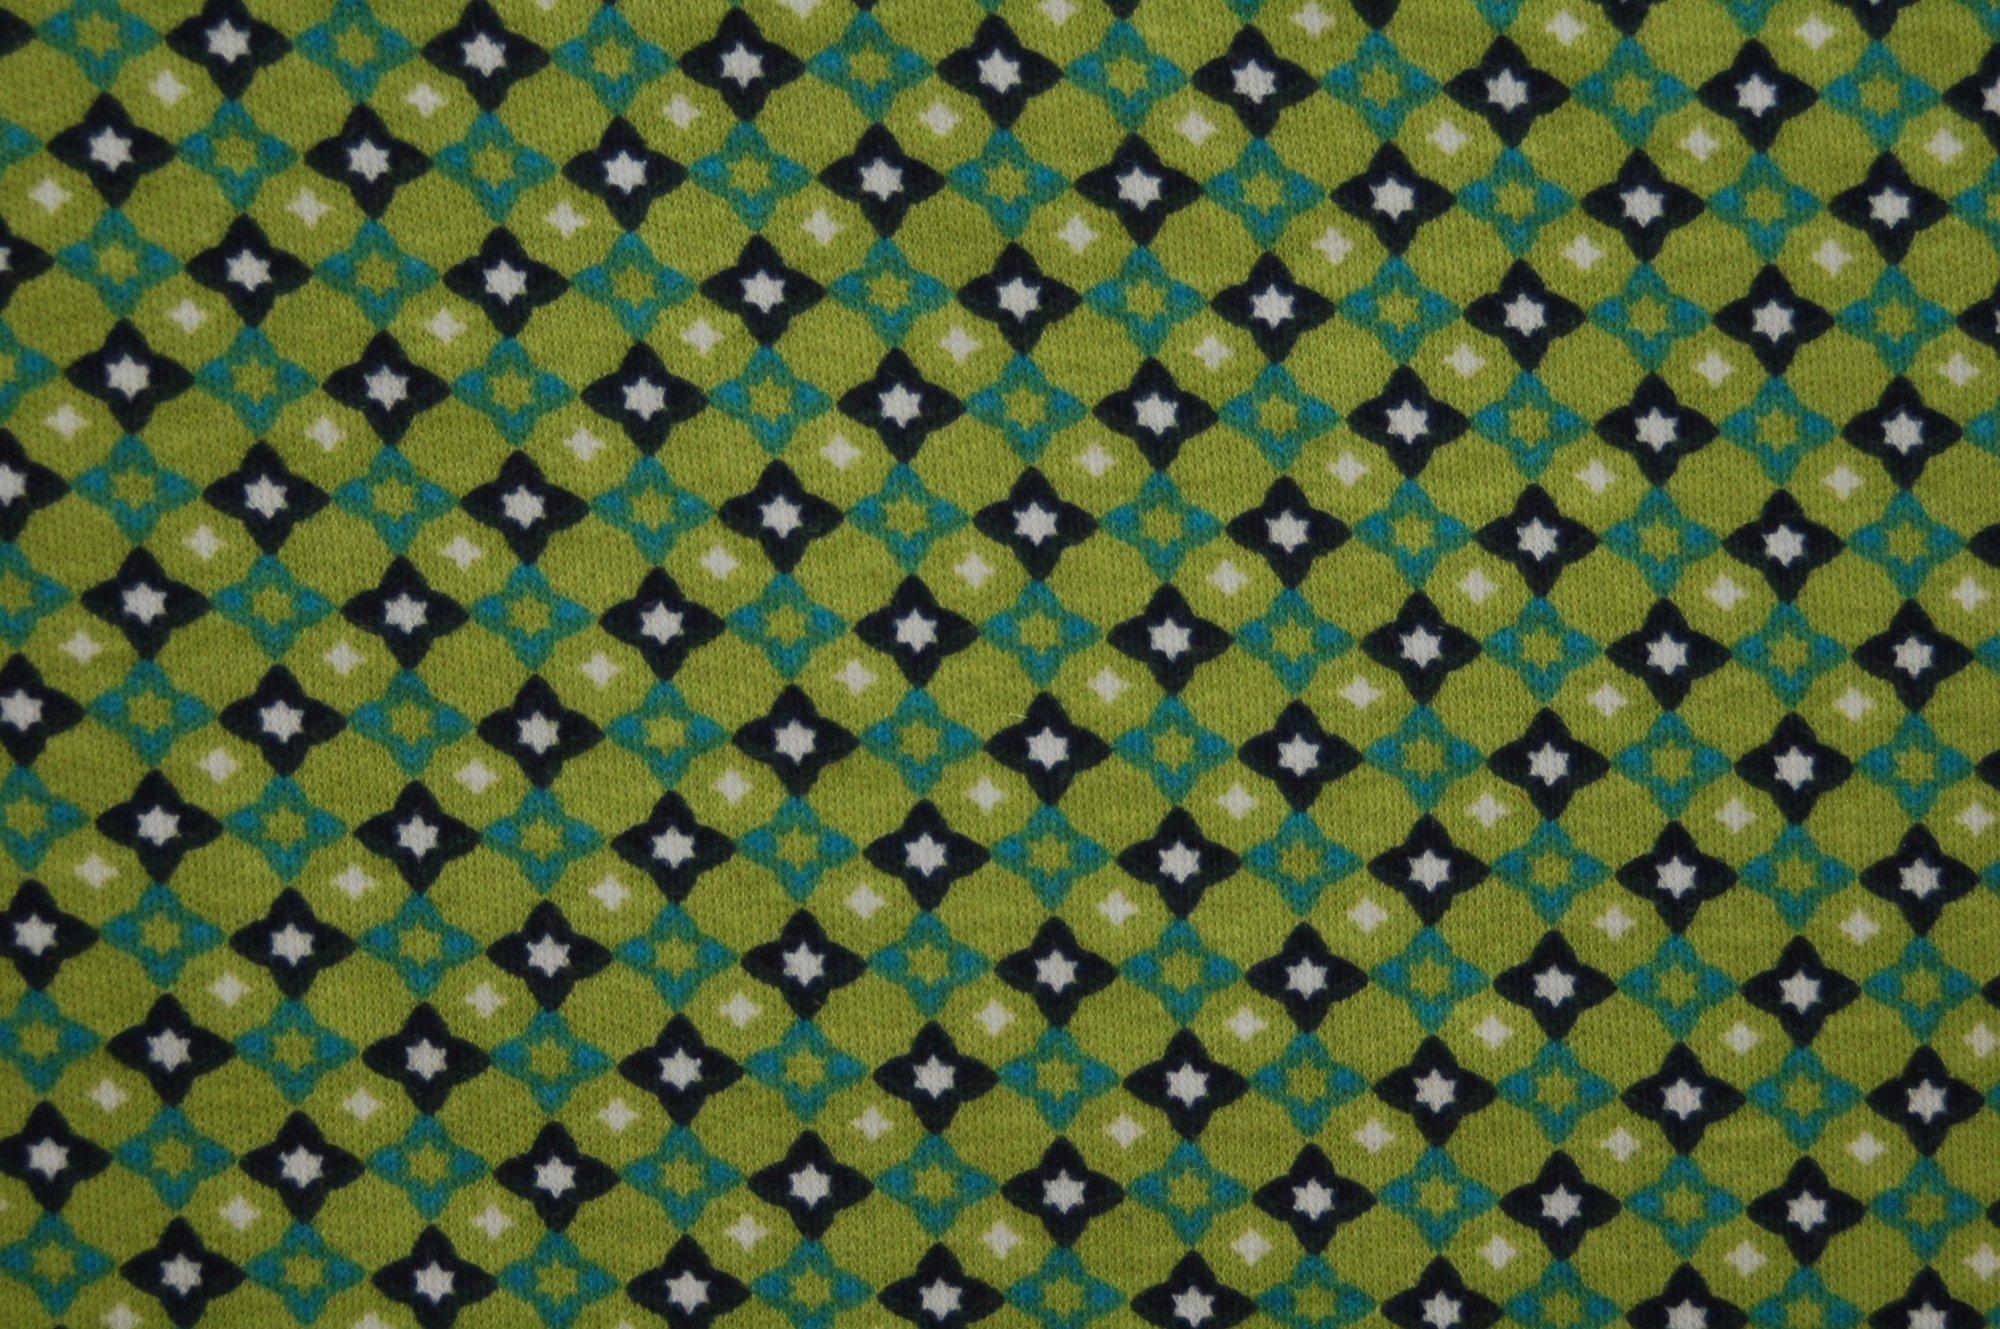 Little Star Knit from Monaluna